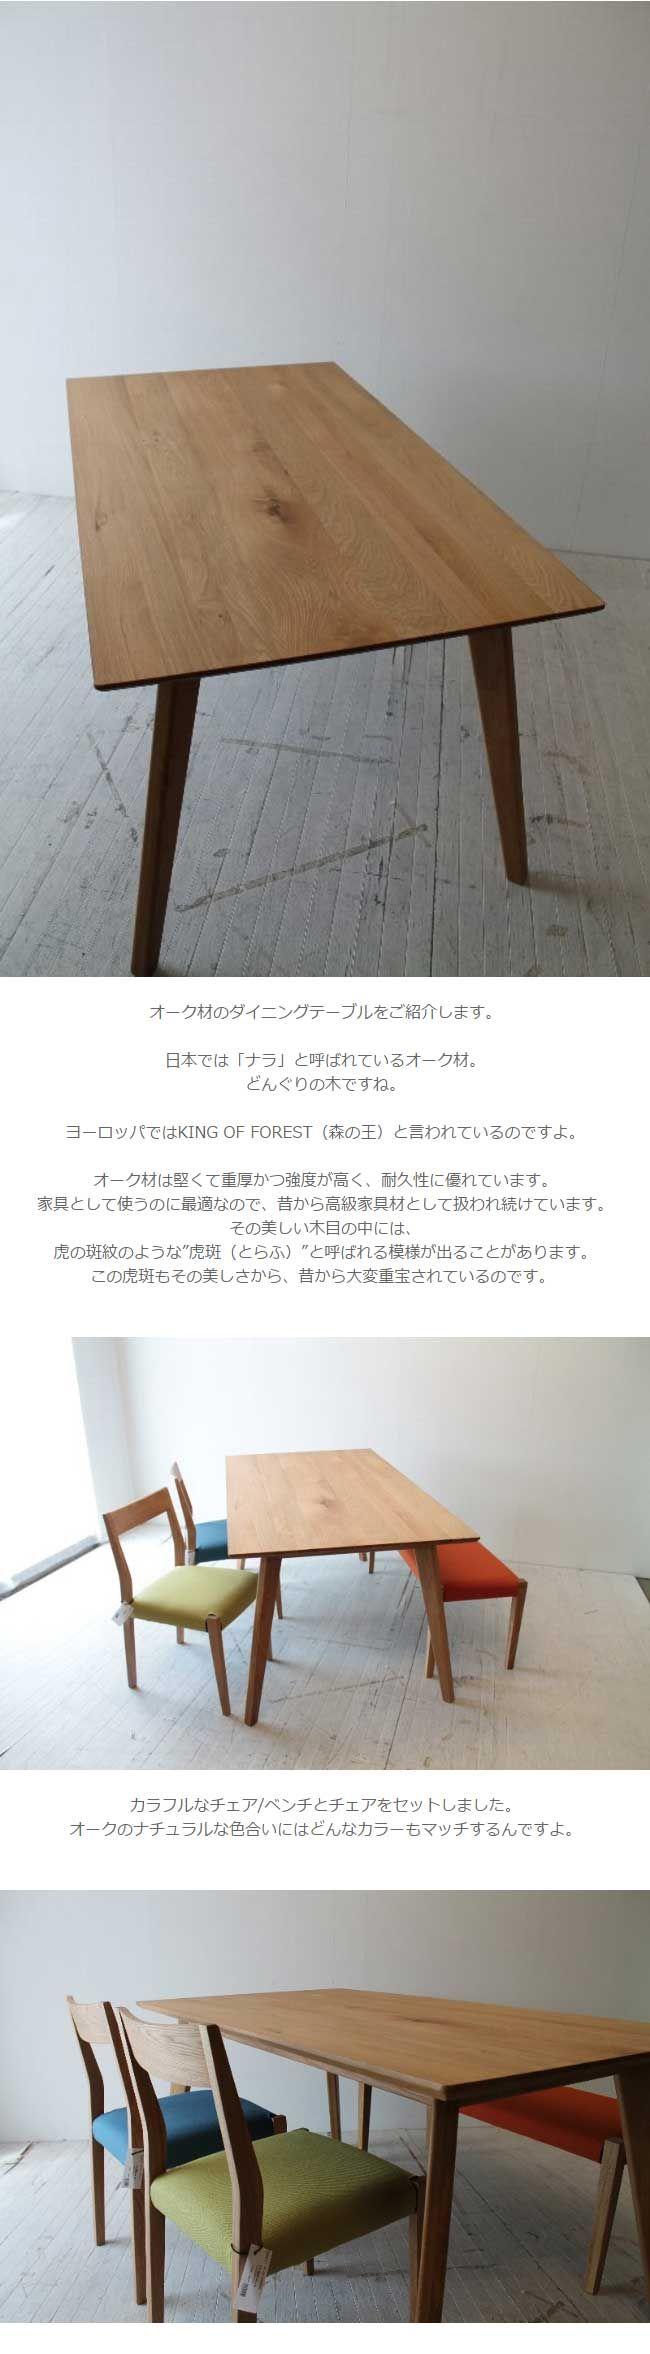 NORTEのオーク無垢材テーブル。北欧 150ダイニングテーブル NRT-150T-AM202 オーク材